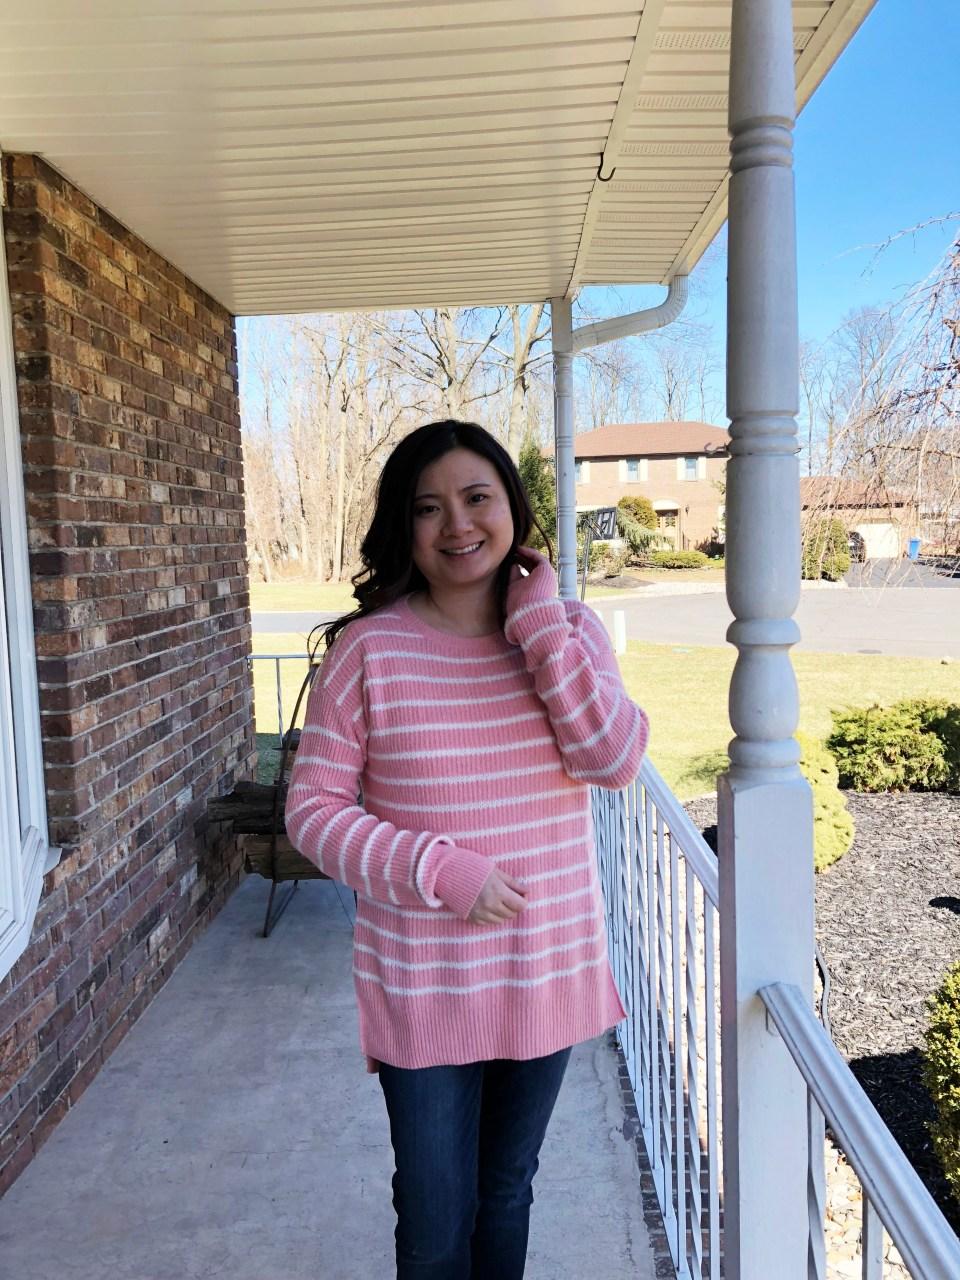 Pink & White Striped Sweater 8